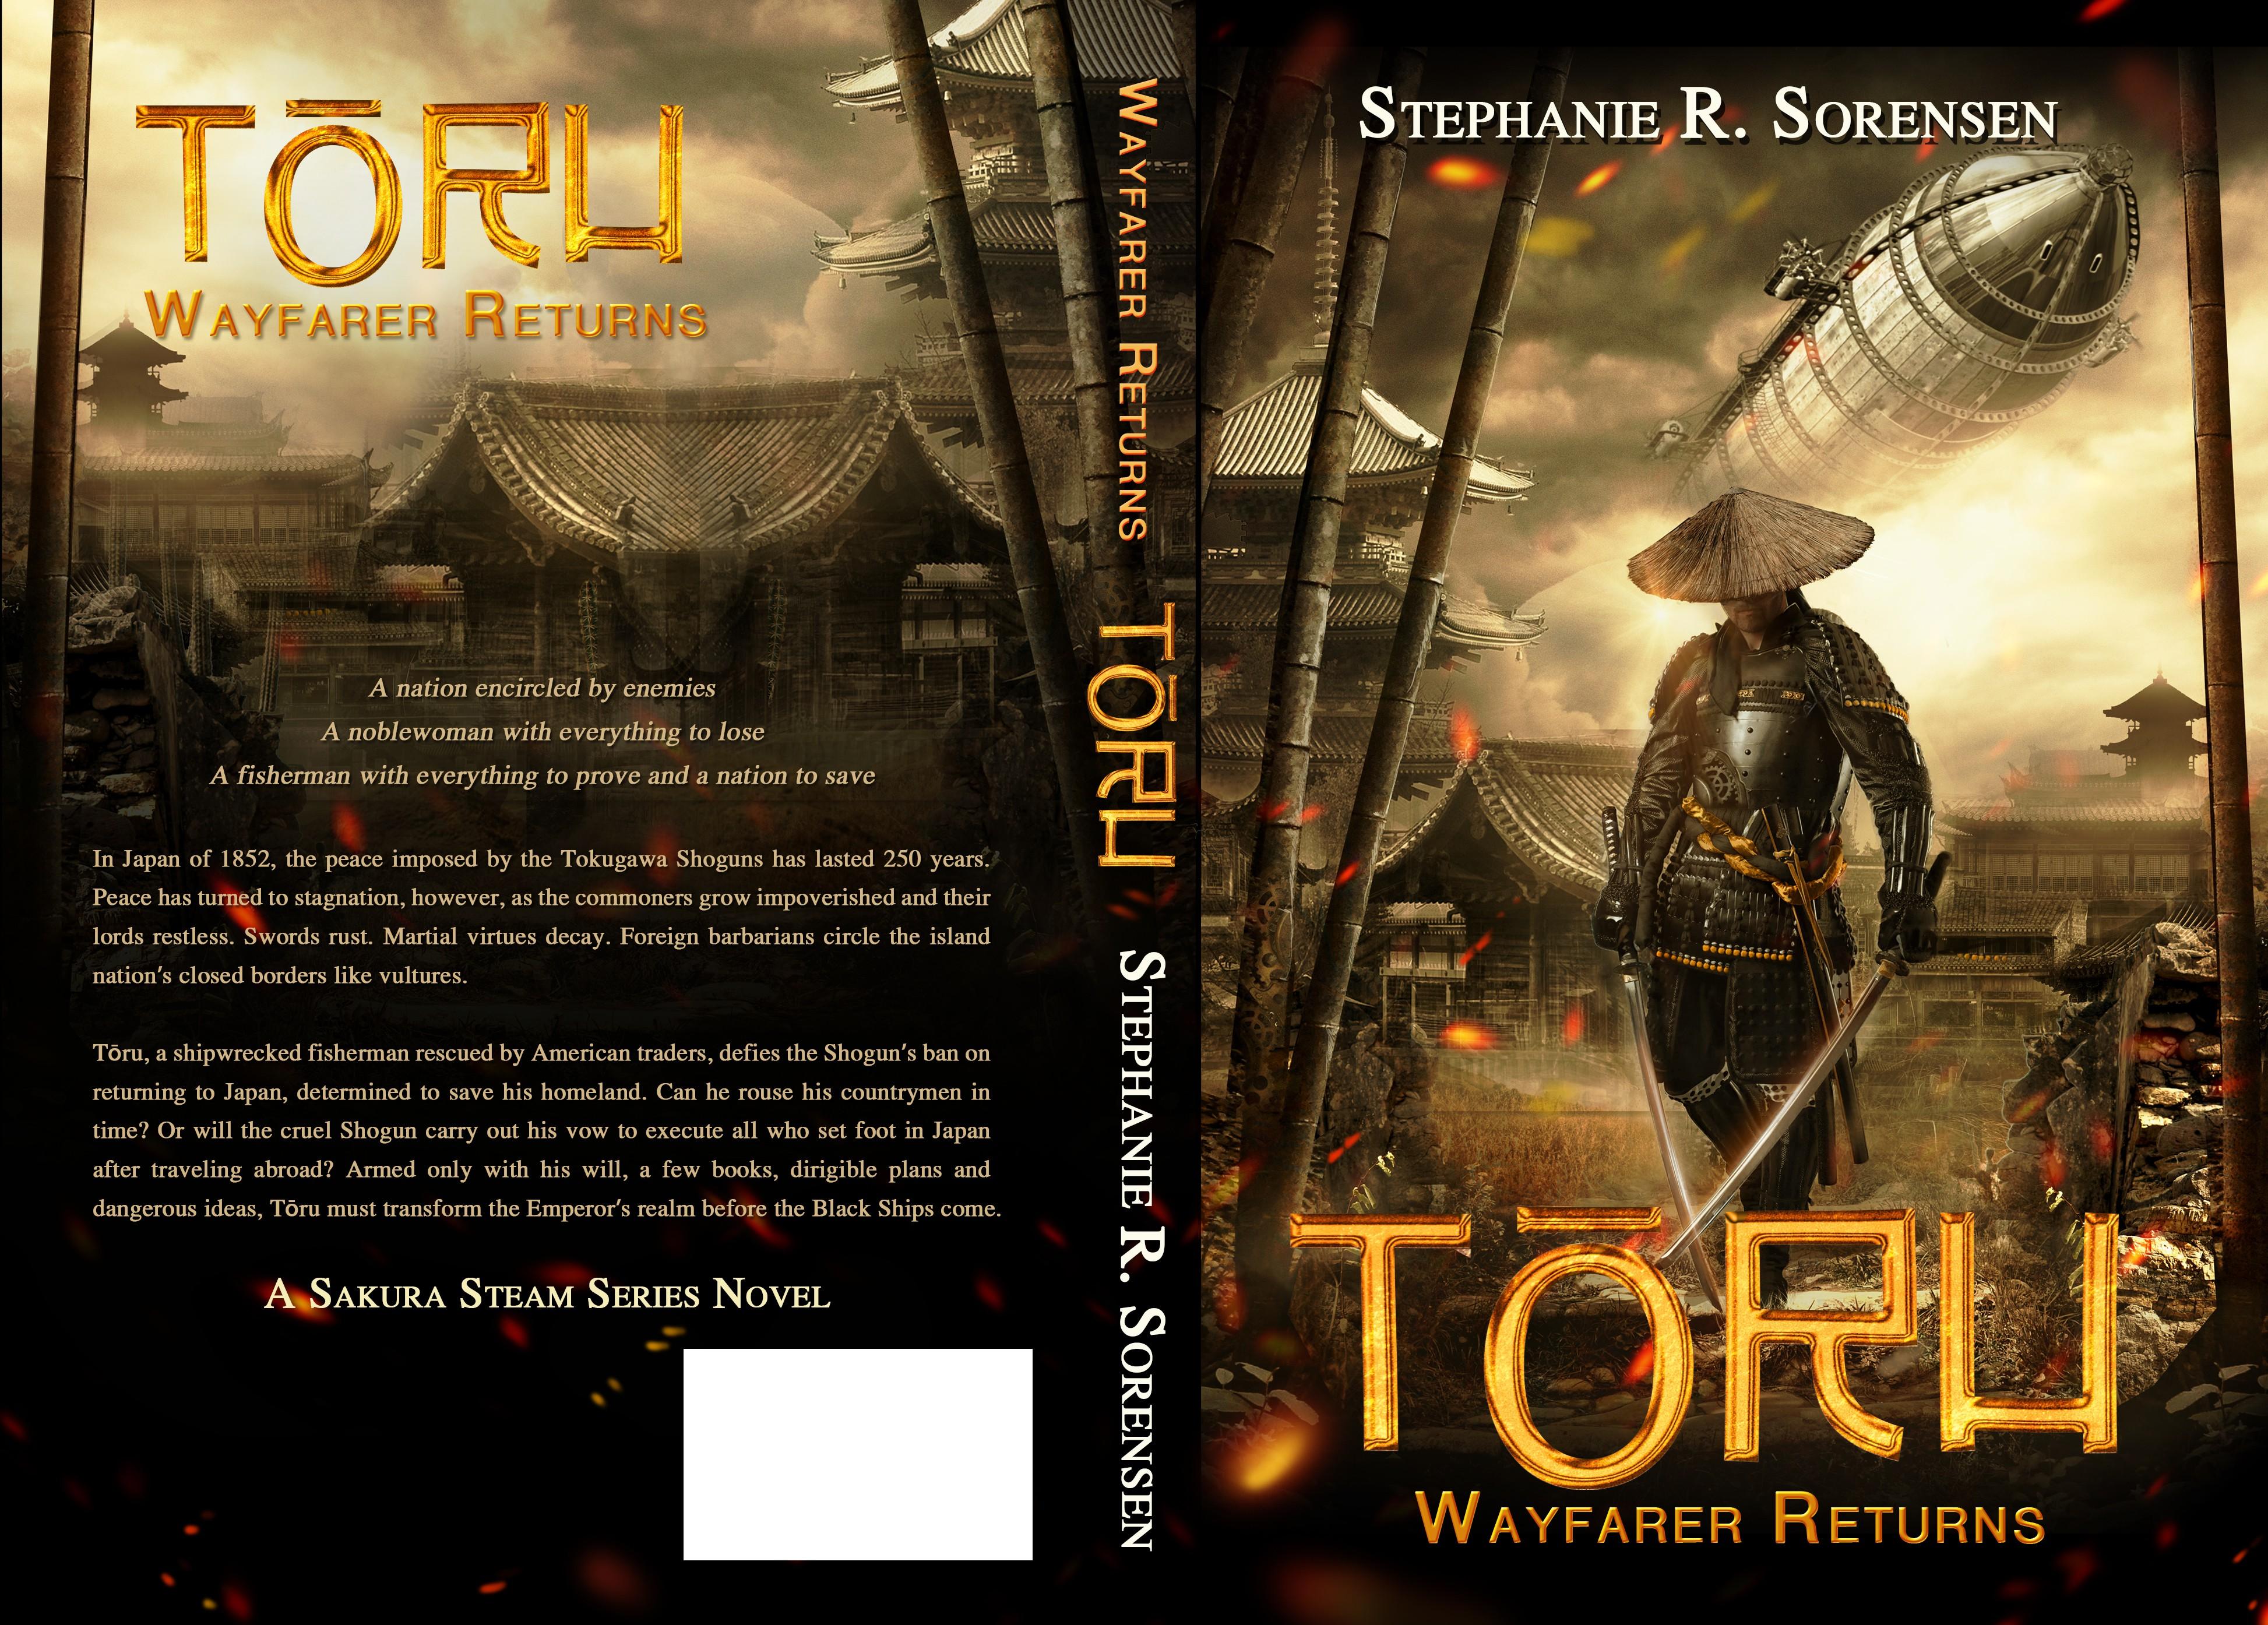 Create a book cover for a samurai steampunk technofantasy novel